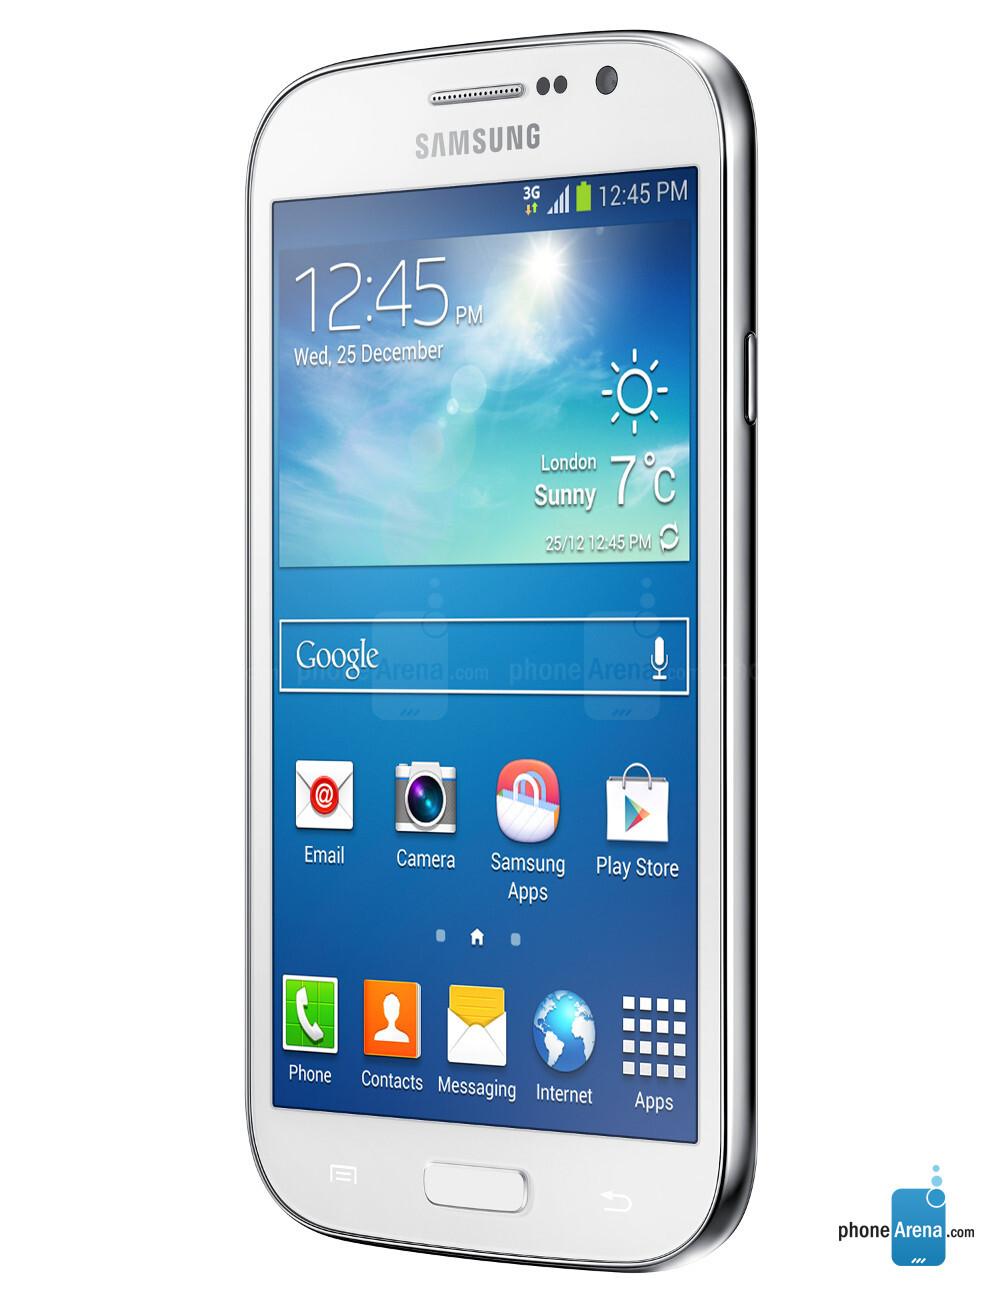 galaxy grand single sim release date Samsung galaxy grand i9082 android smartphone announced dec 2012 released 2013, january 162g, 96mm sim, dual sim (mini-sim, dual stand-by).